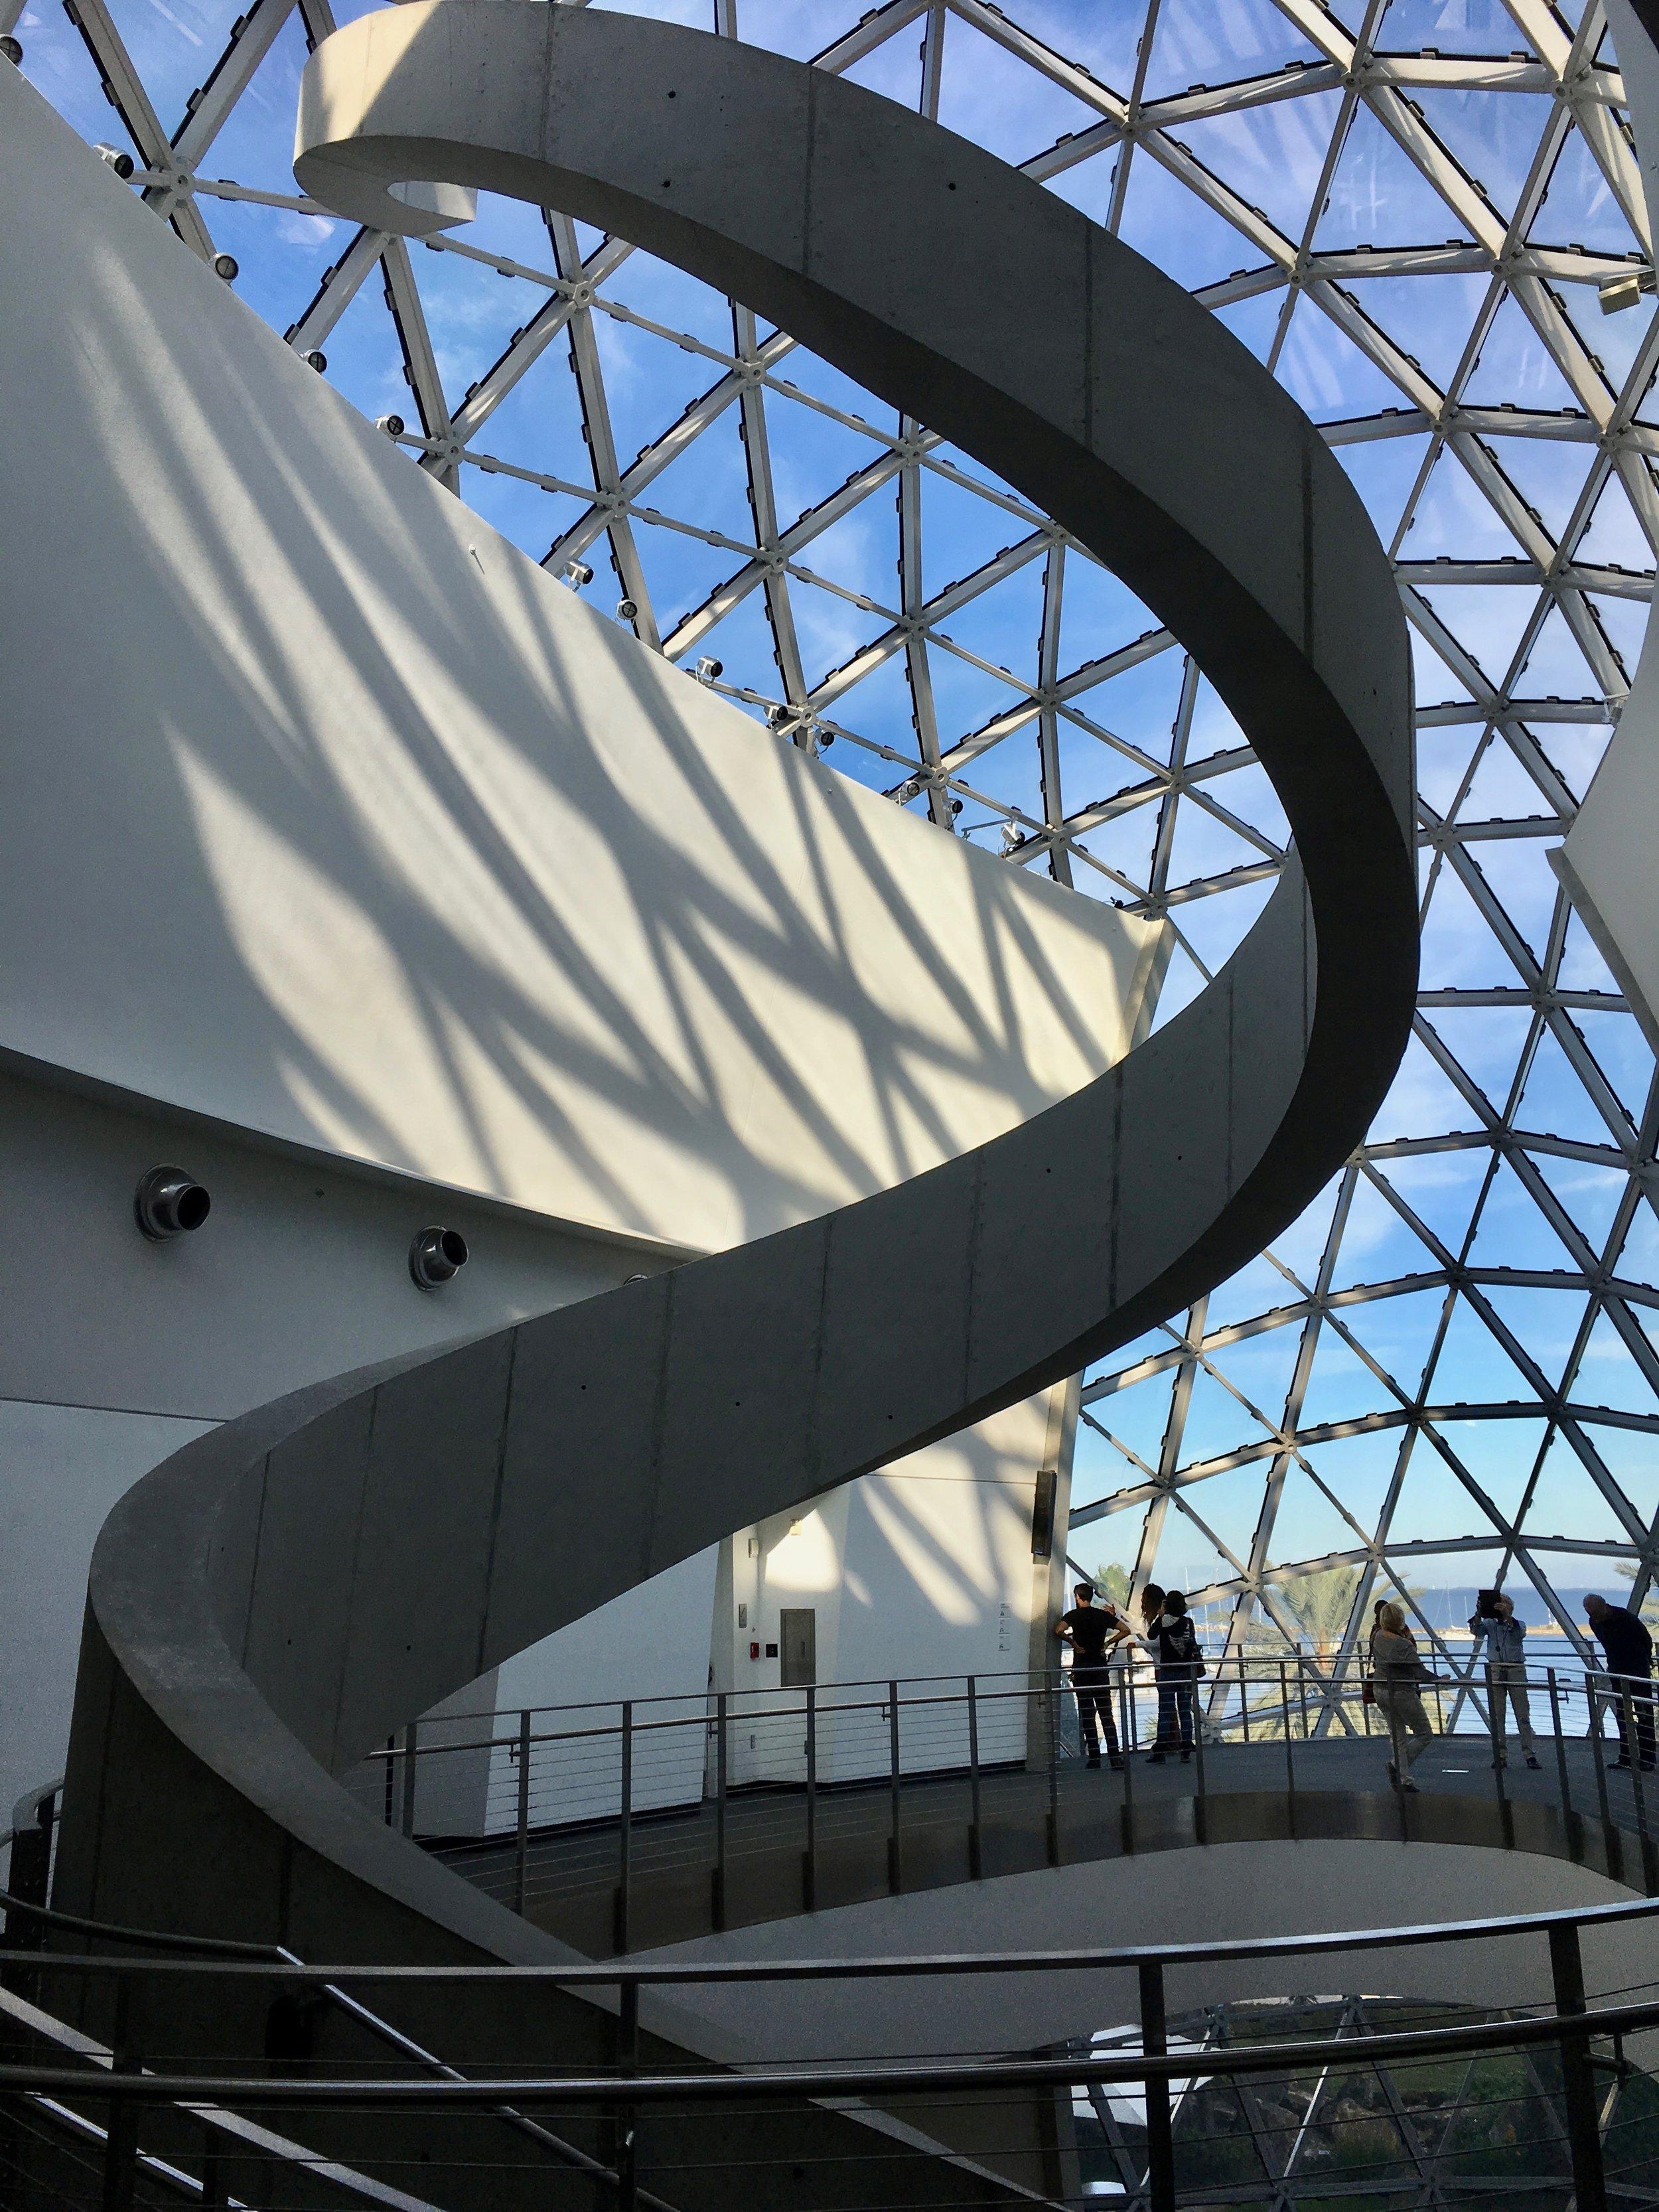 Salvador Dali Museum in St. Petersburg—excellent docent-led tour